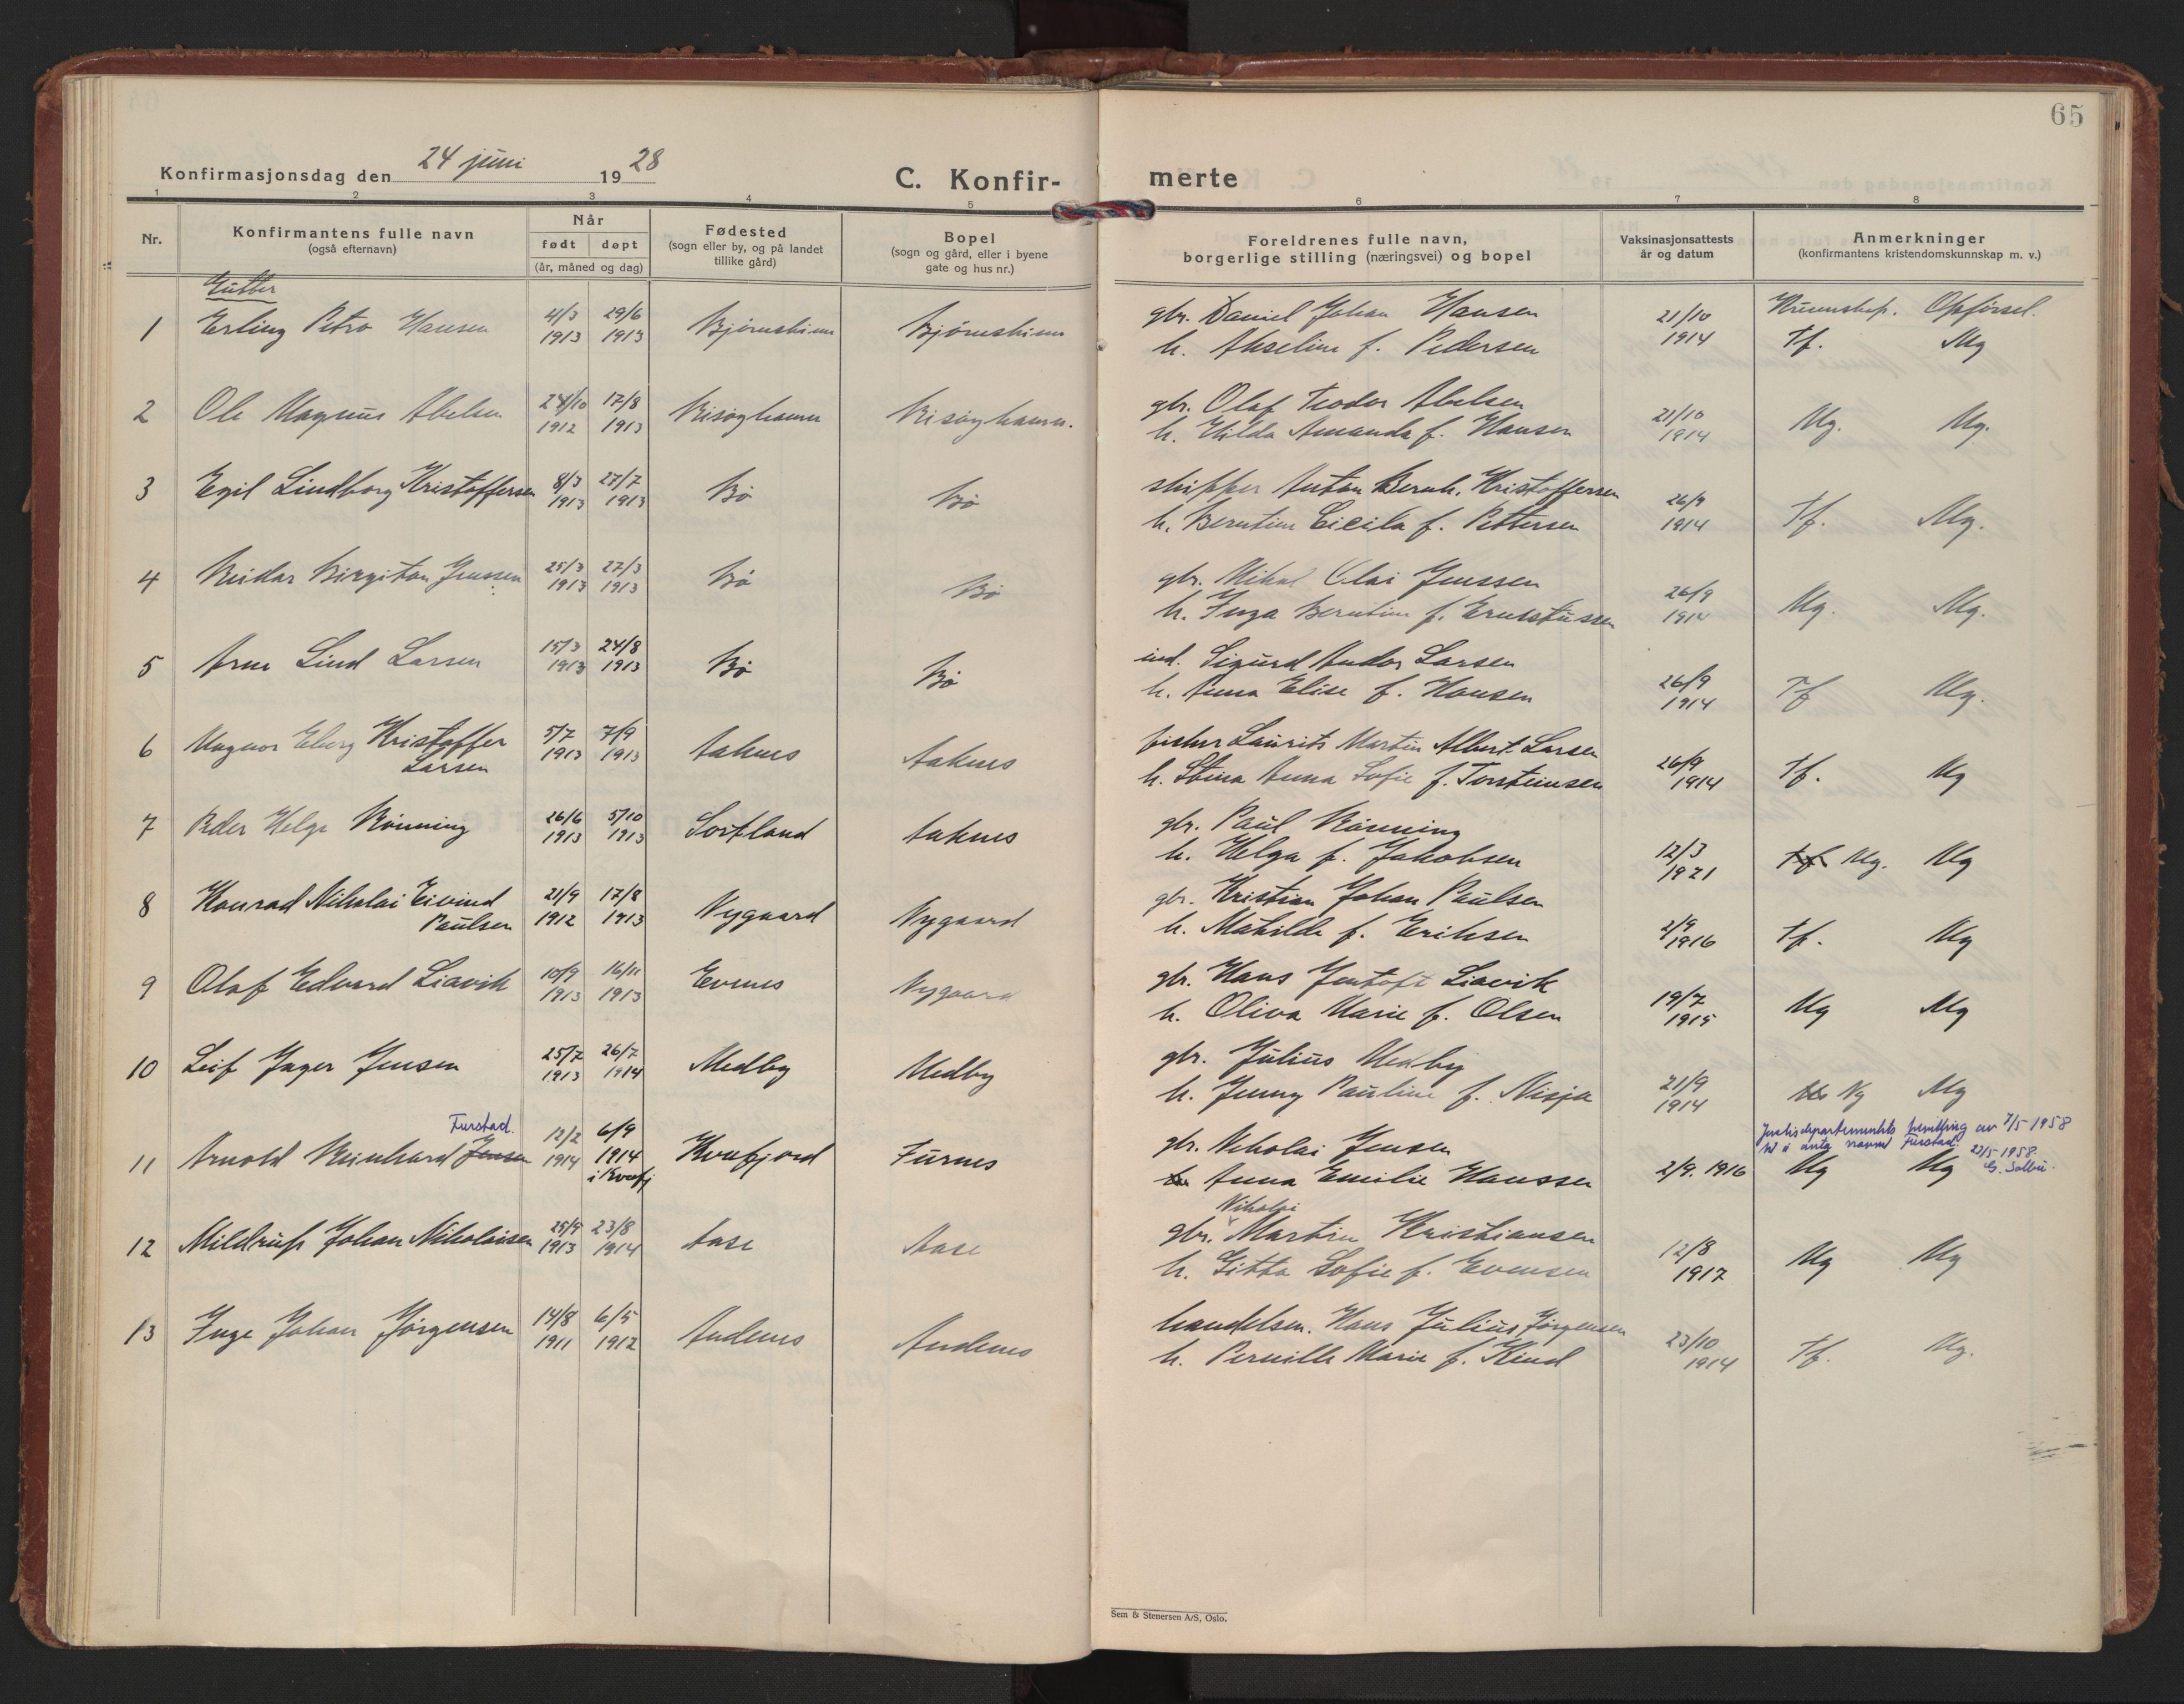 SAT, Ministerialprotokoller, klokkerbøker og fødselsregistre - Nordland, 898/L1424: Ministerialbok nr. 898A04, 1928-1946, s. 65